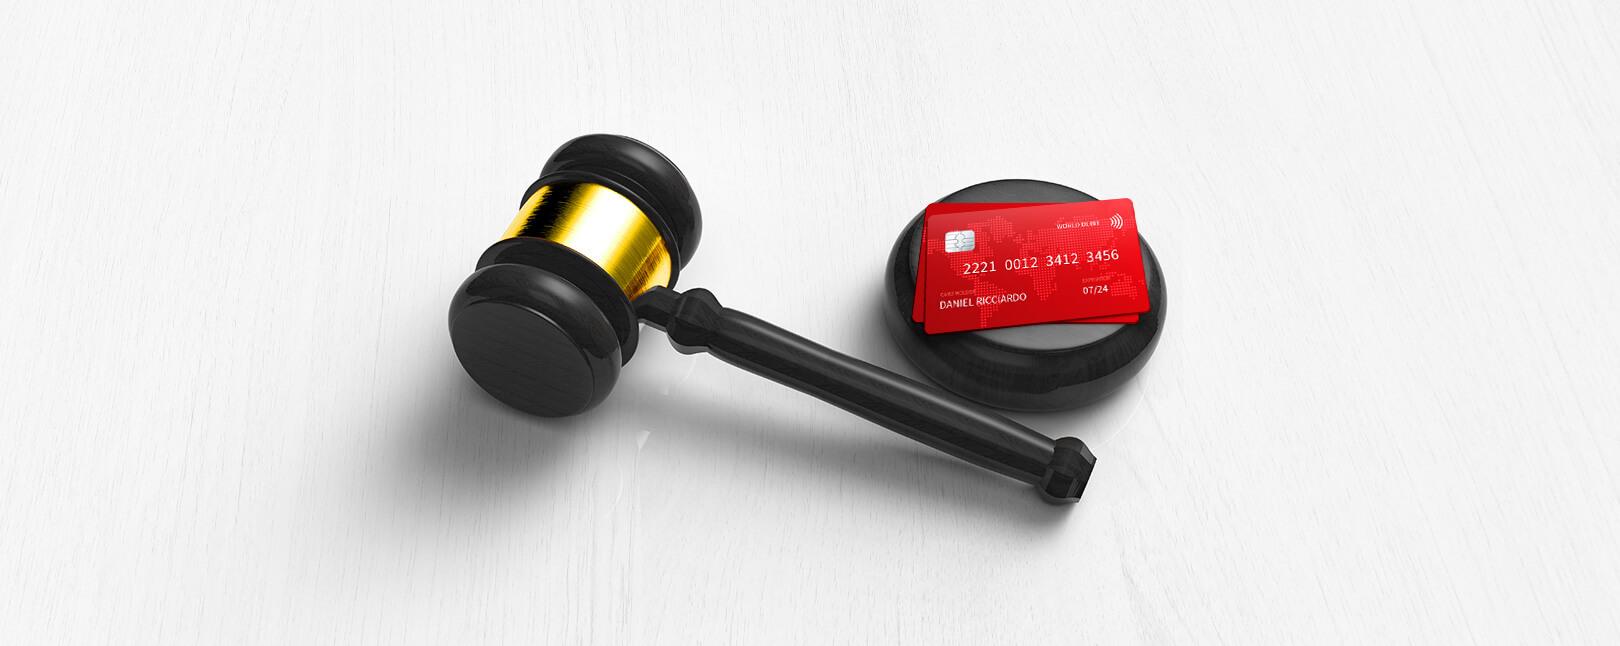 credit card chargeback laws